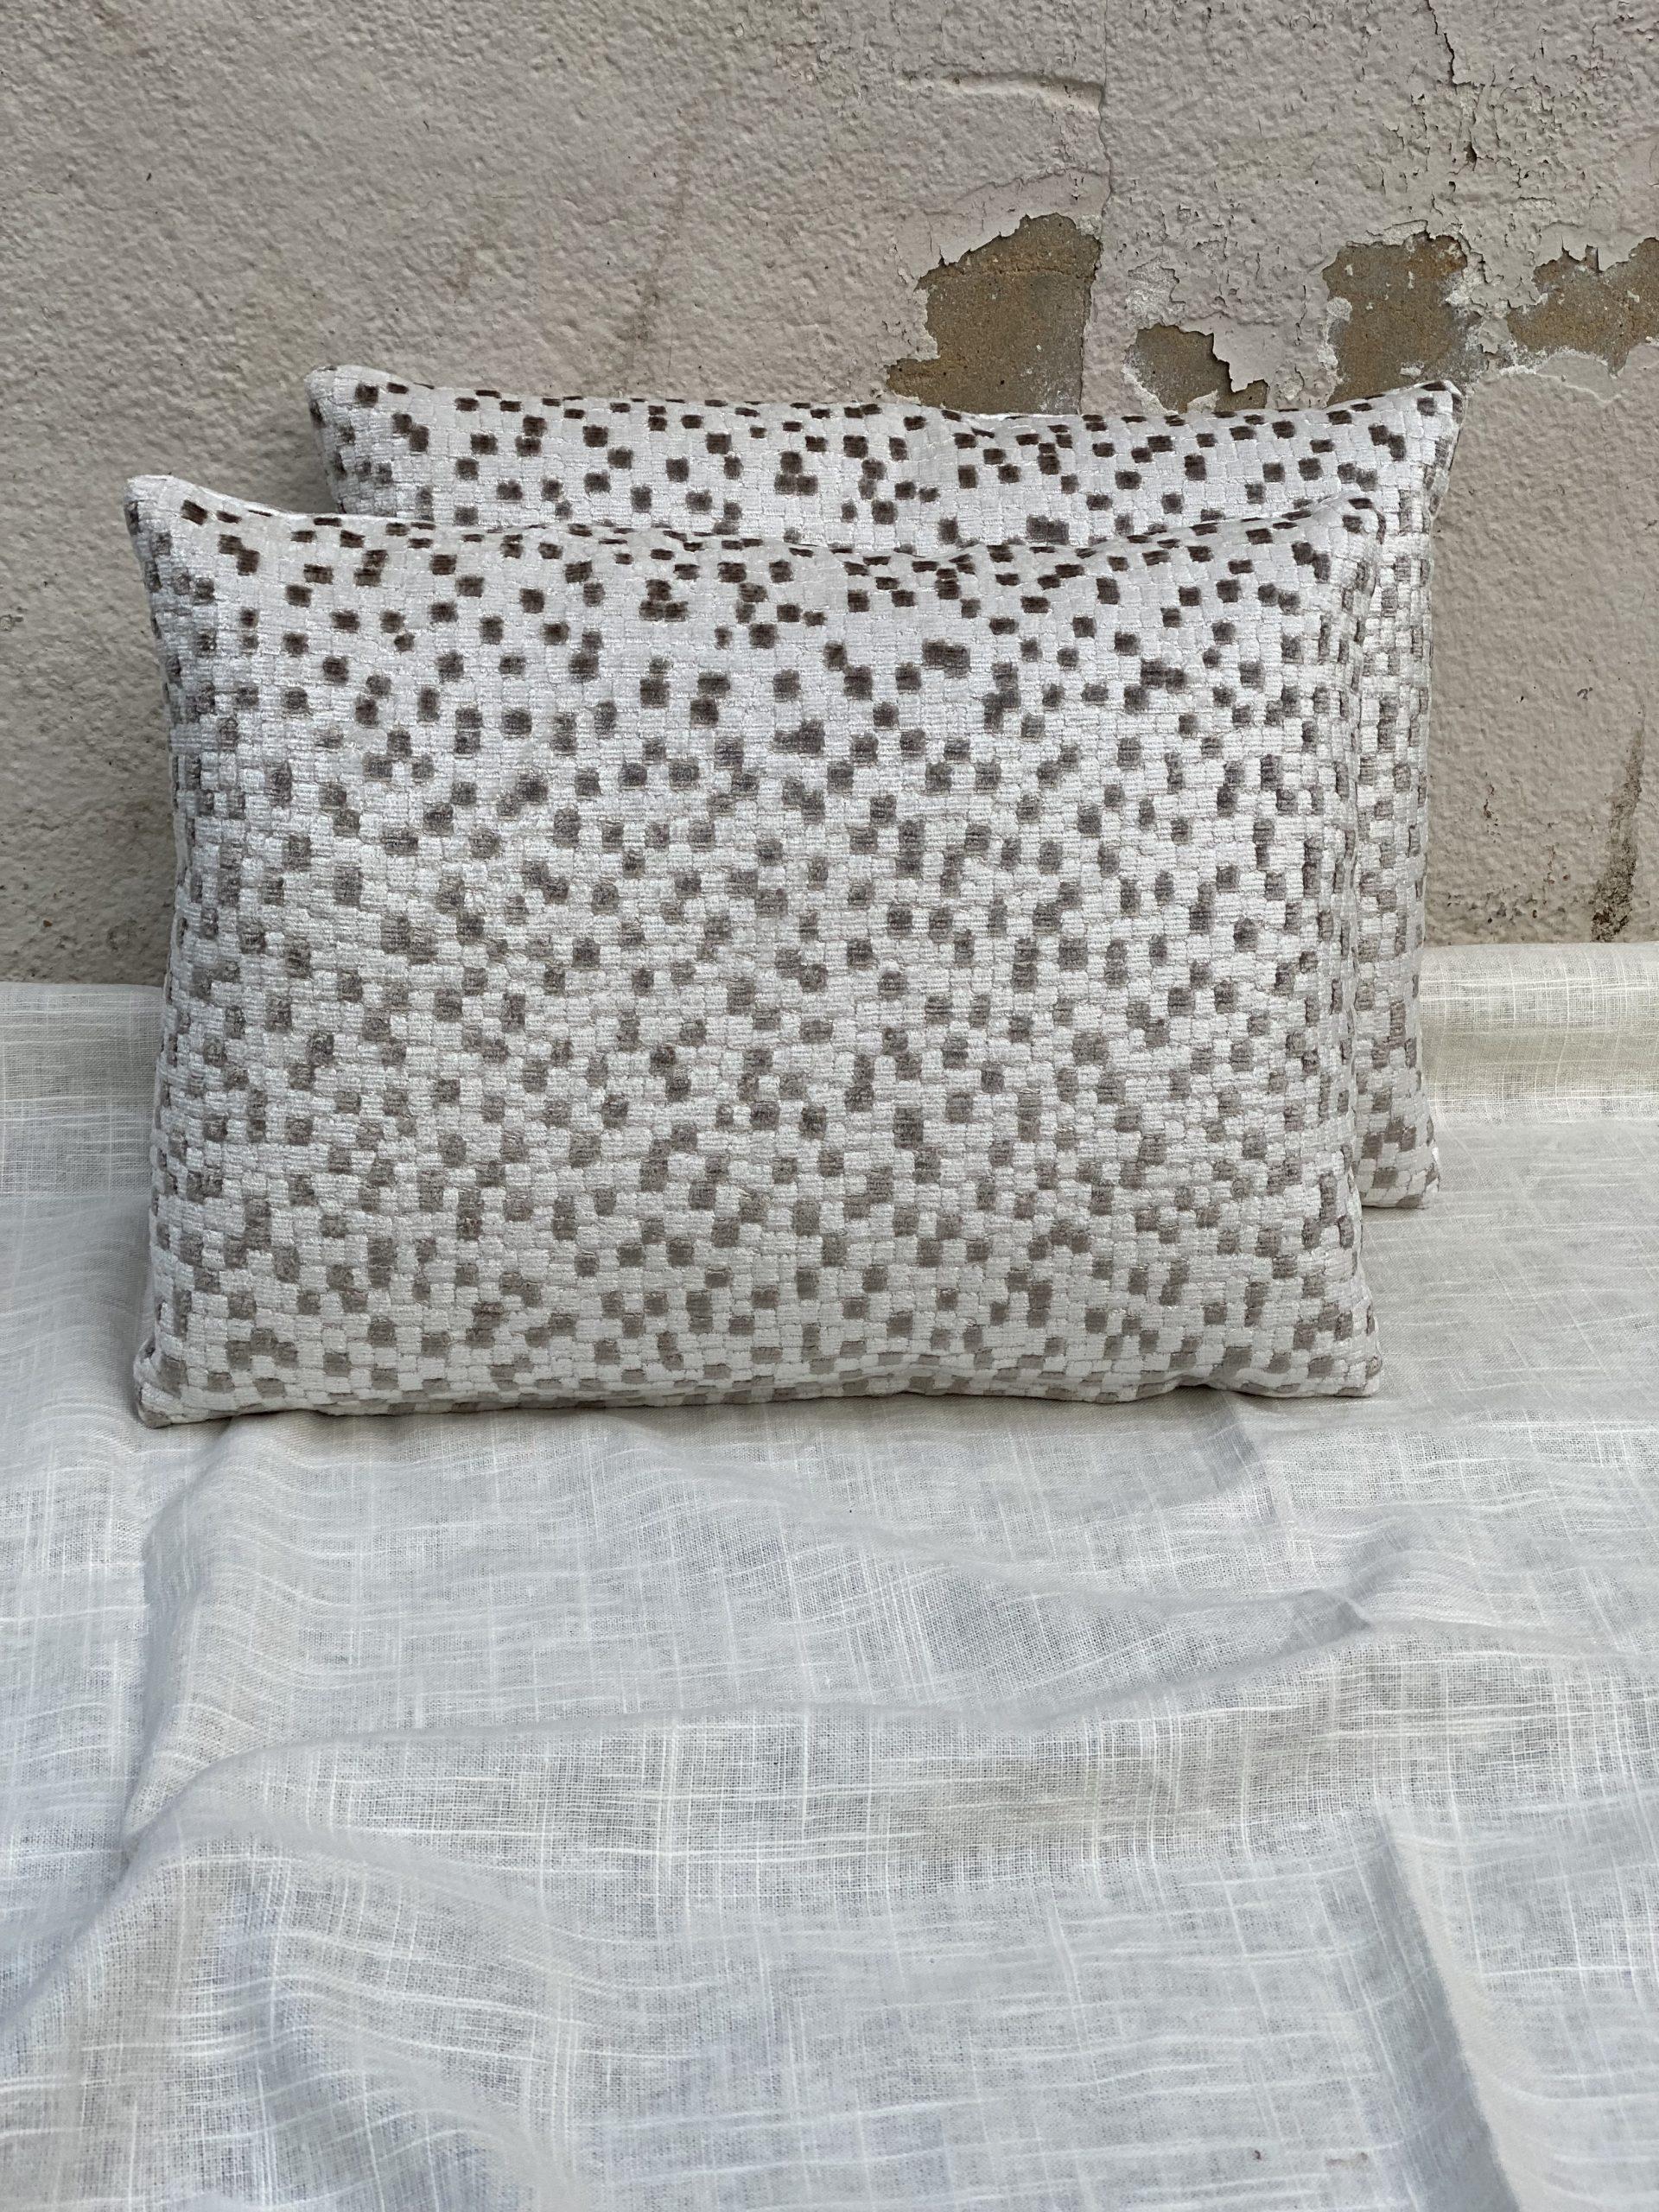 Mosaic Pattern Pillows